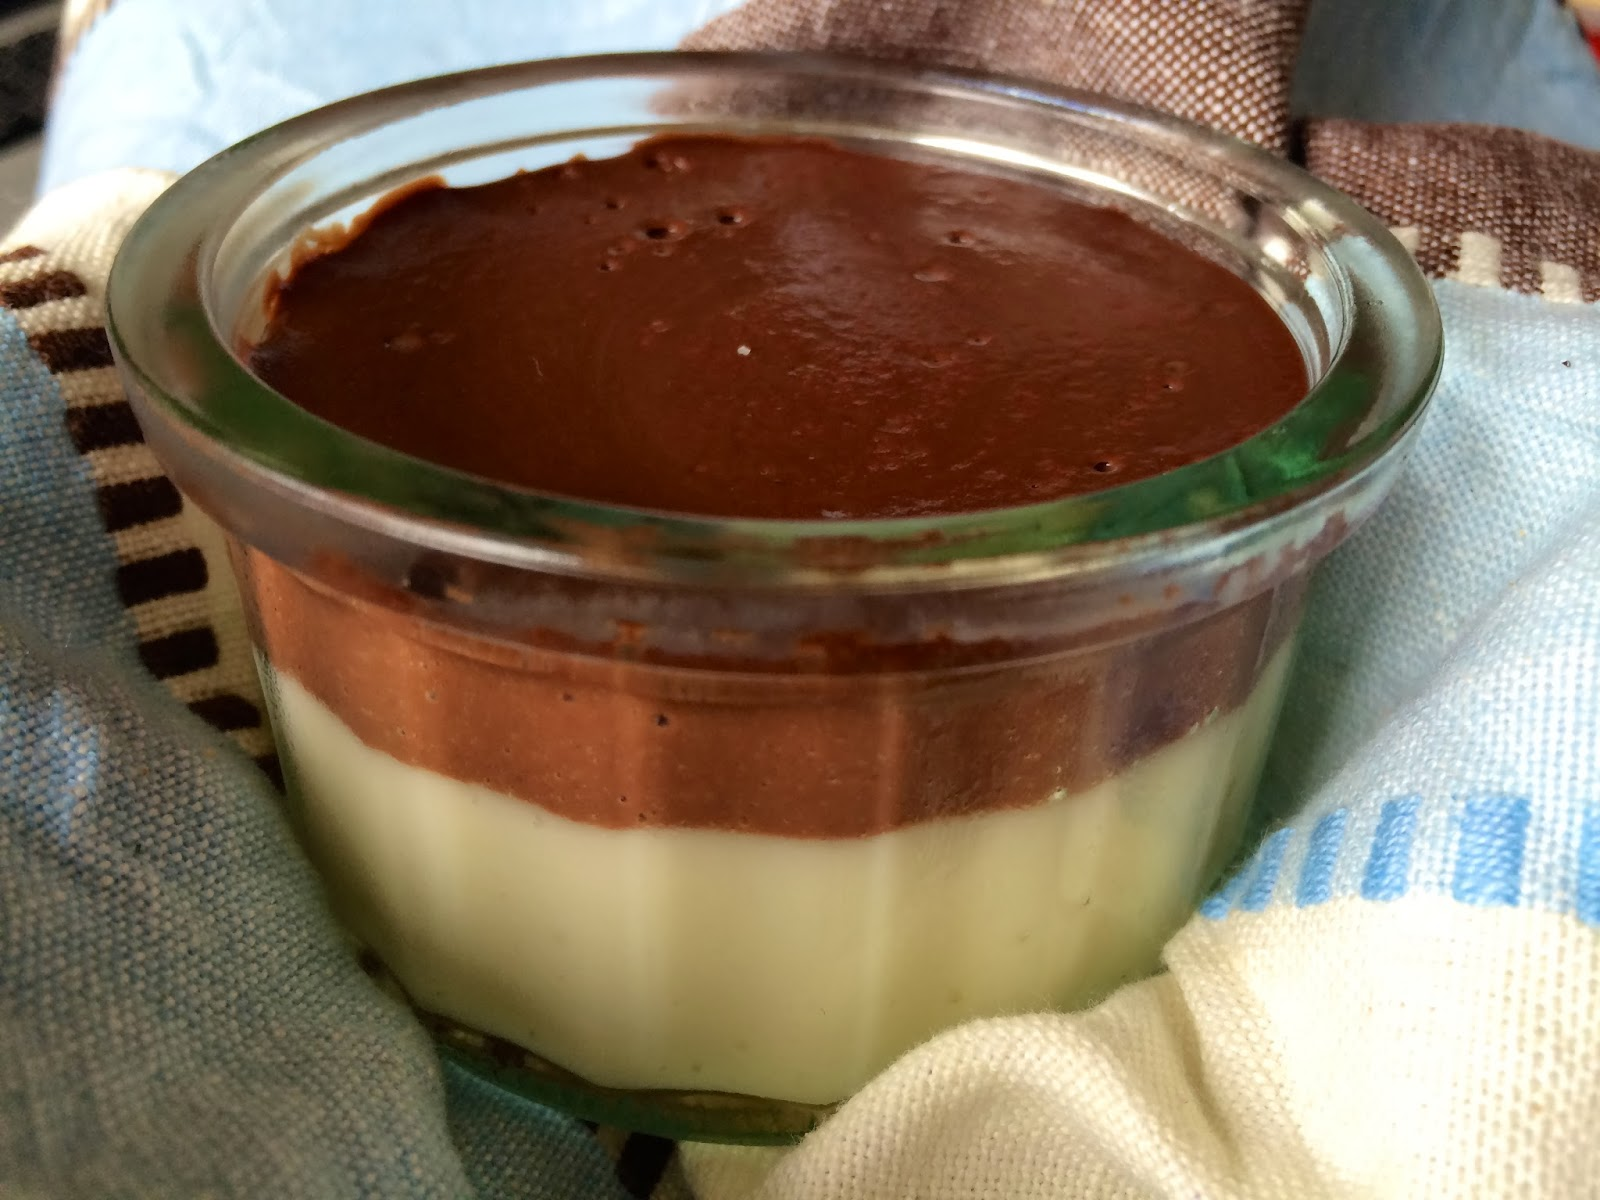 Thermomix Layered chocolate and vanilla custards / Natillas bicolor de chocolate y vainilla con la Thermomix